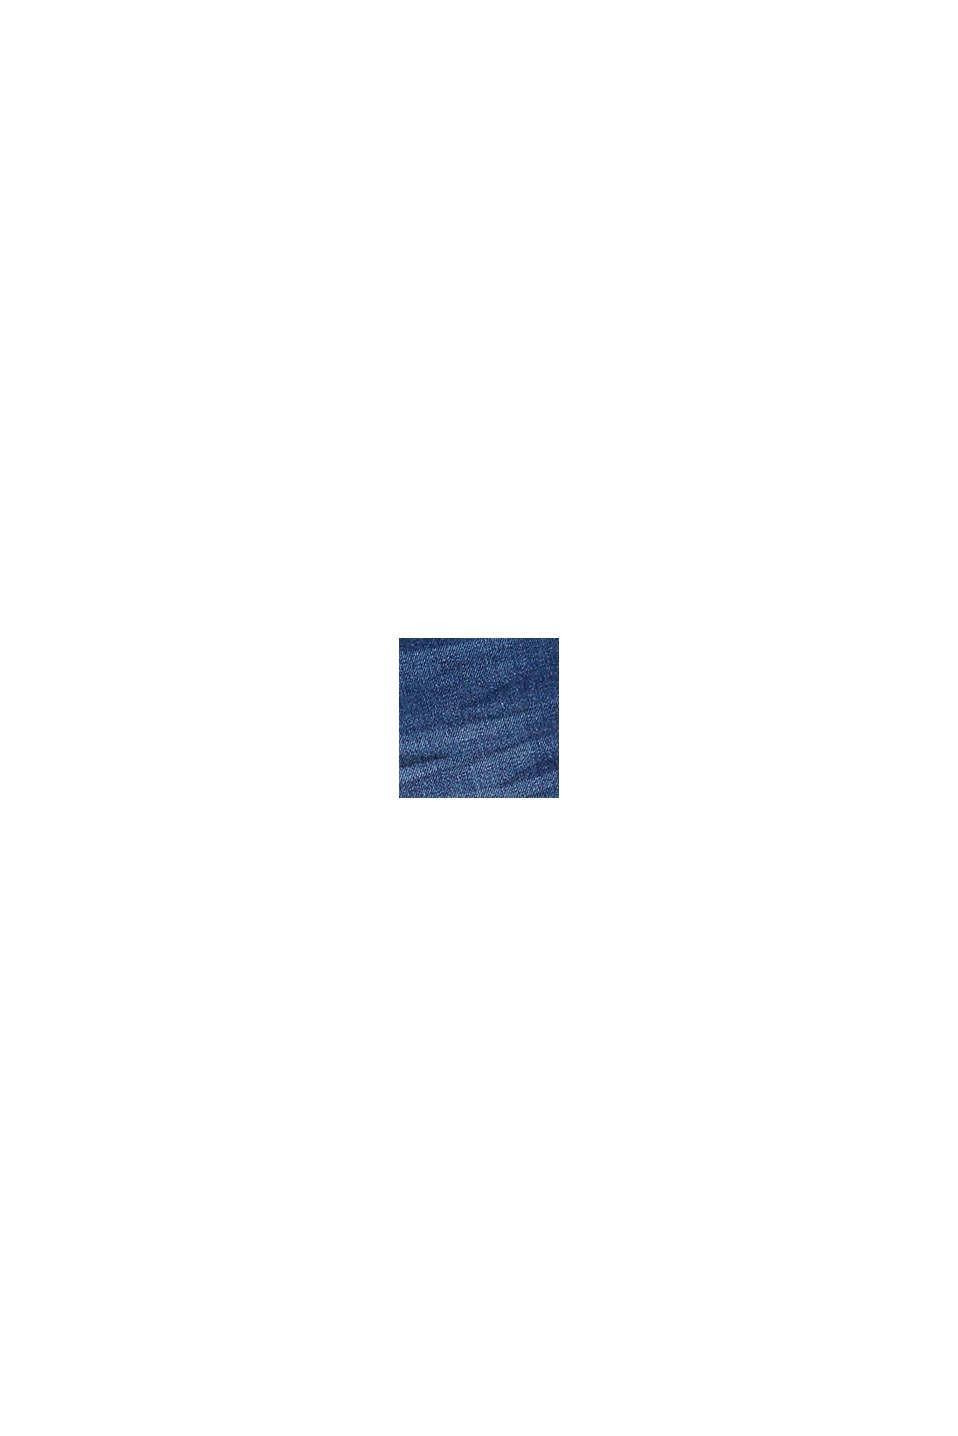 Denim Bermudas in a garment-washed look, BLUE MEDIUM WASHED, swatch